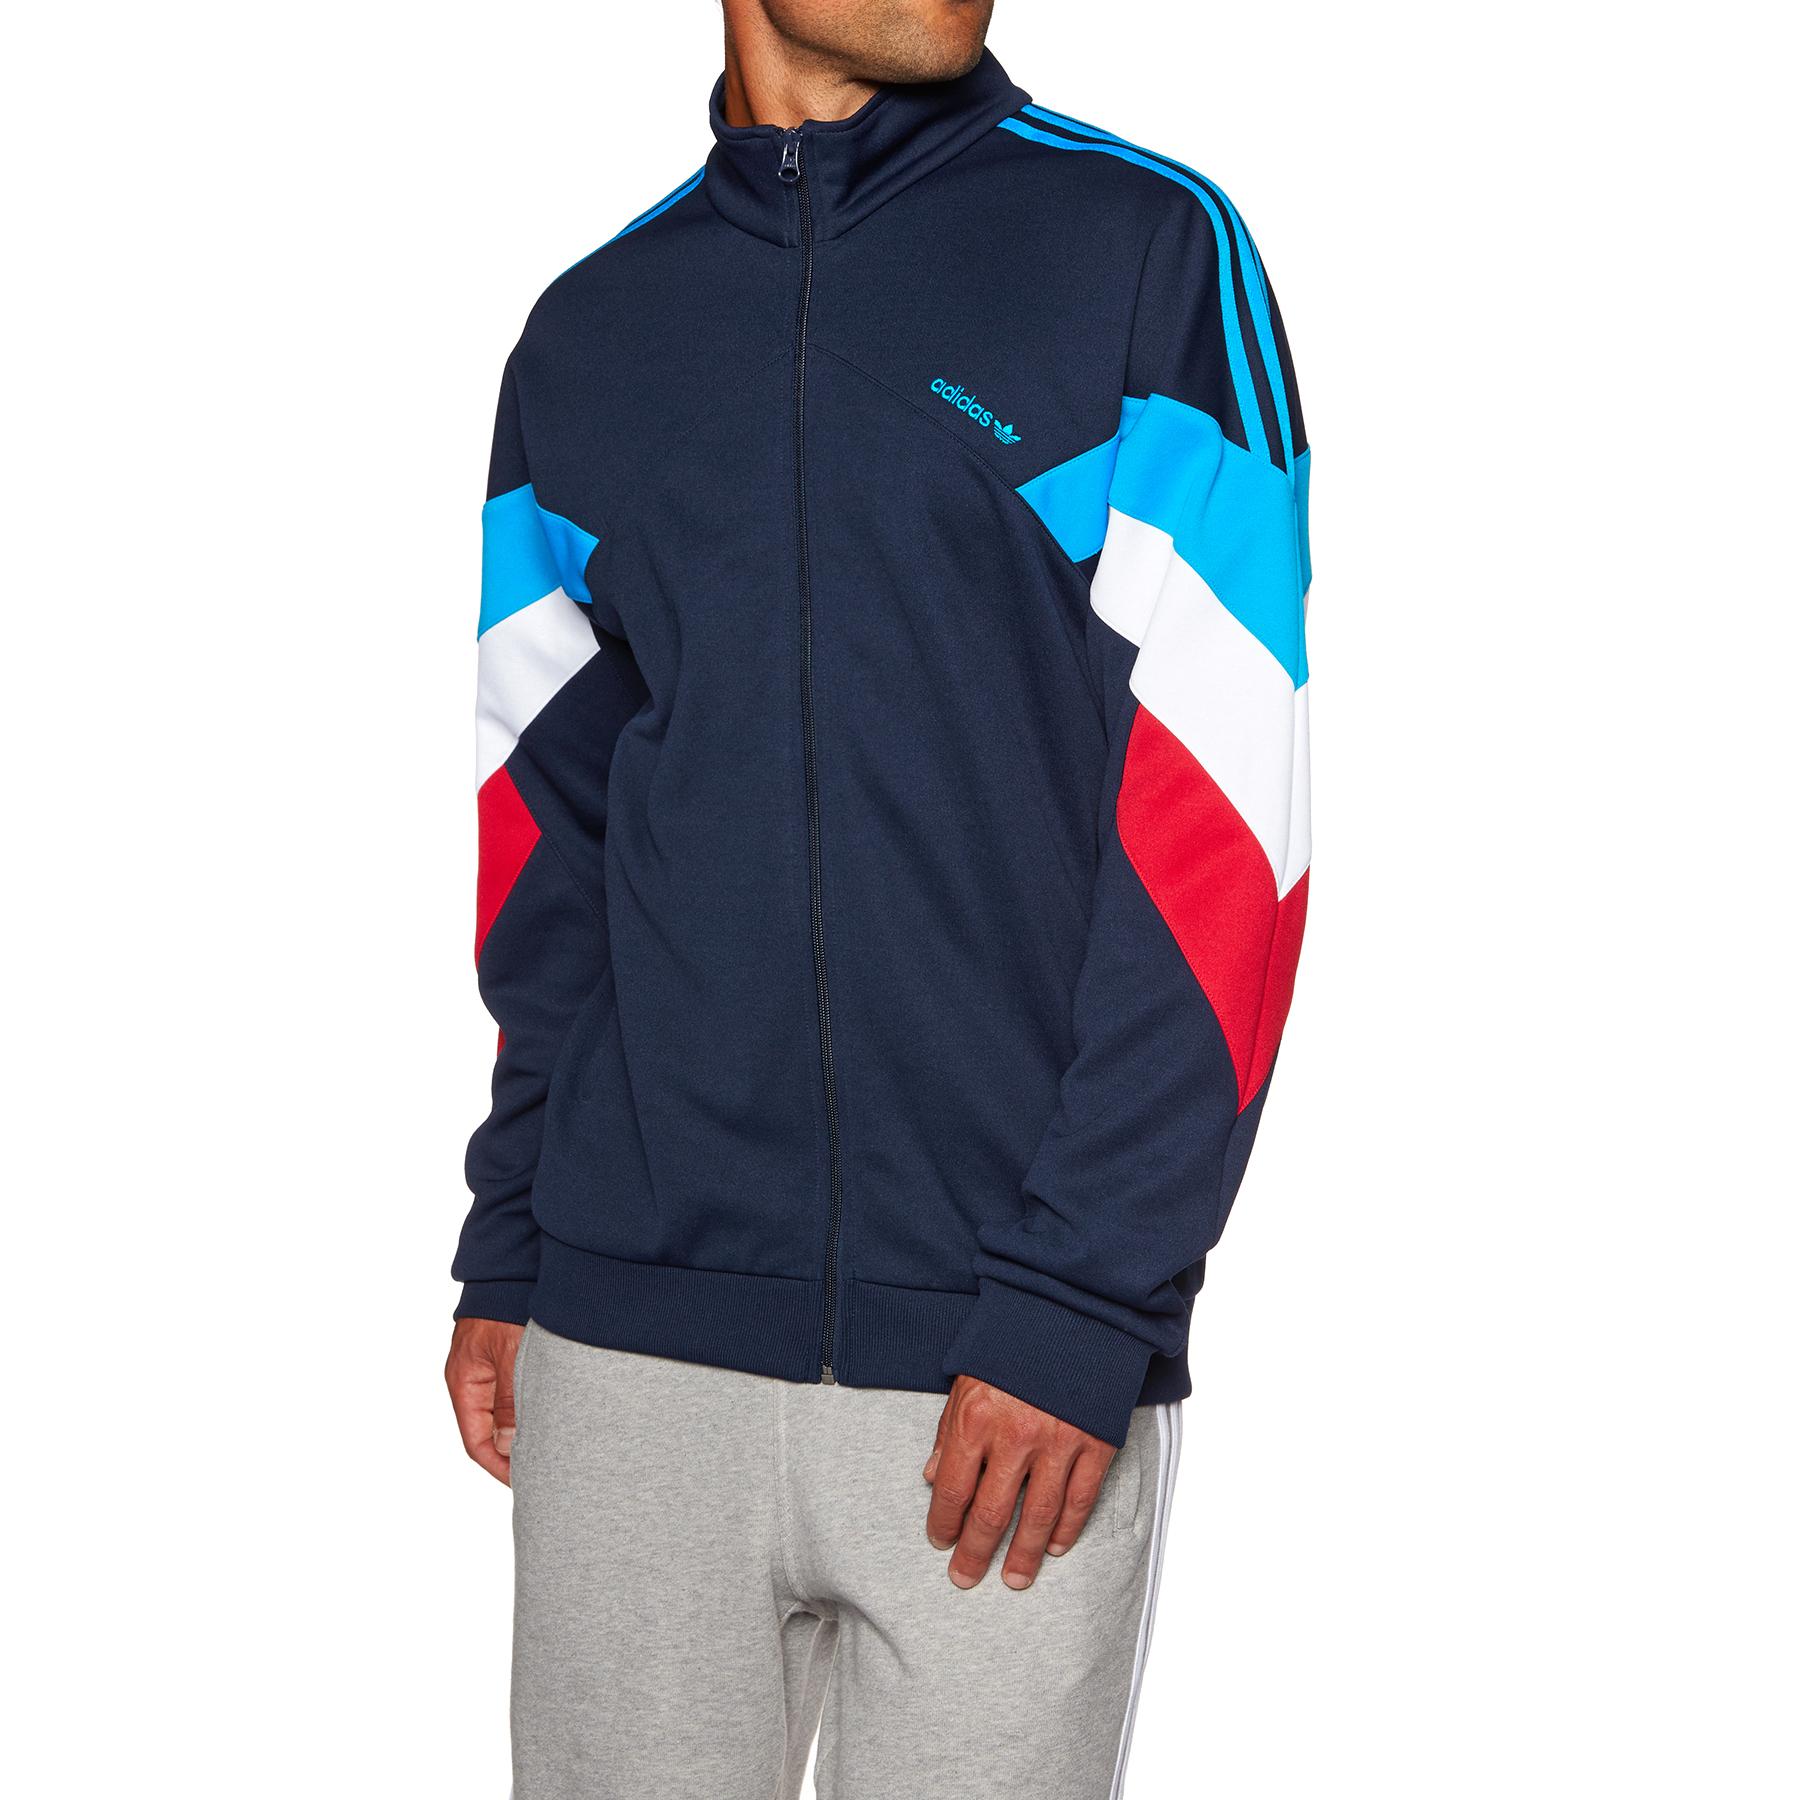 Adidas Originals Palmeston TT Track Jacket Free Delivery